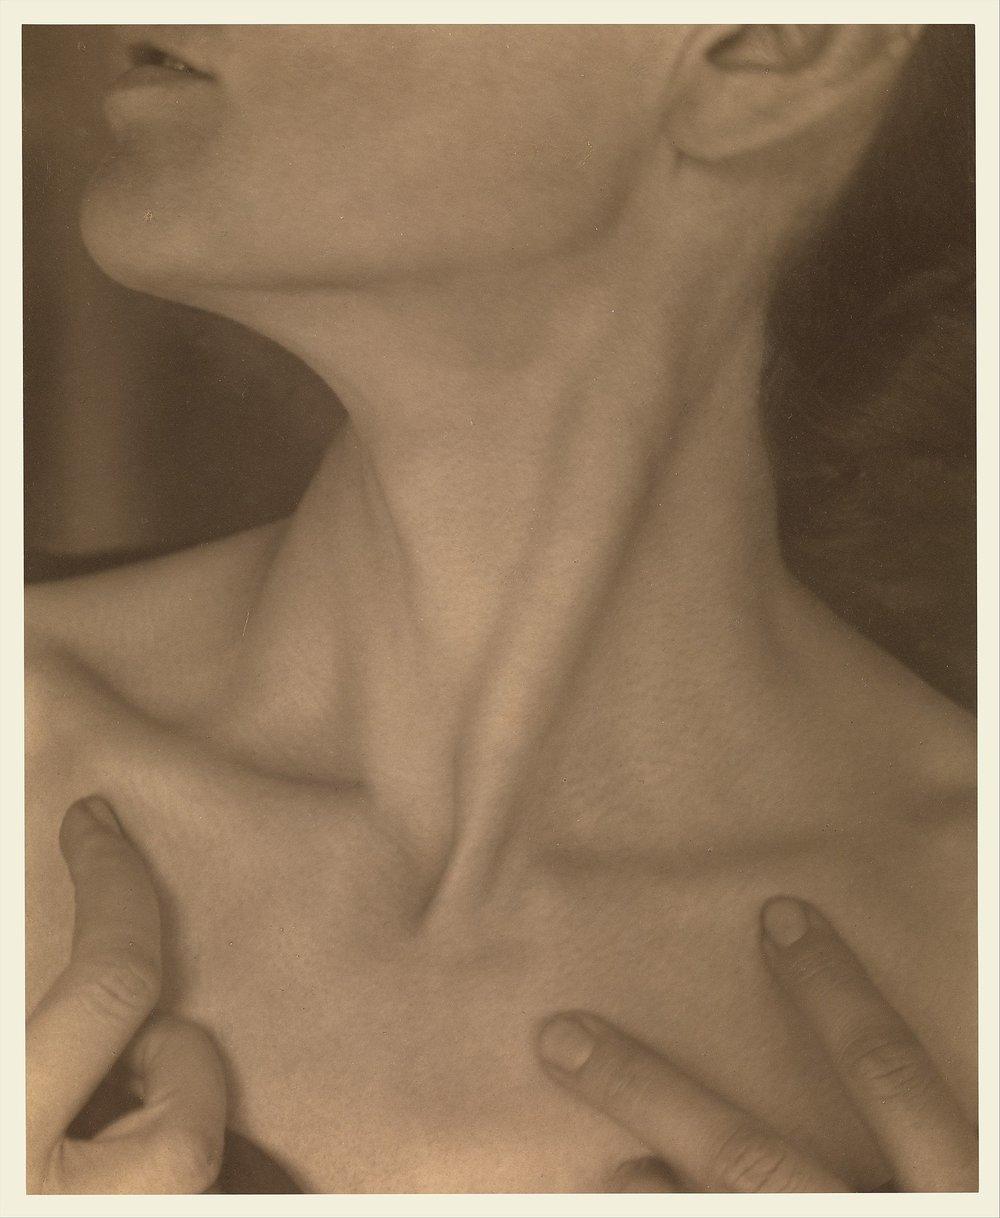 Georgia O'Keeffe — Neck  by Alfred Stieglitz (1921)